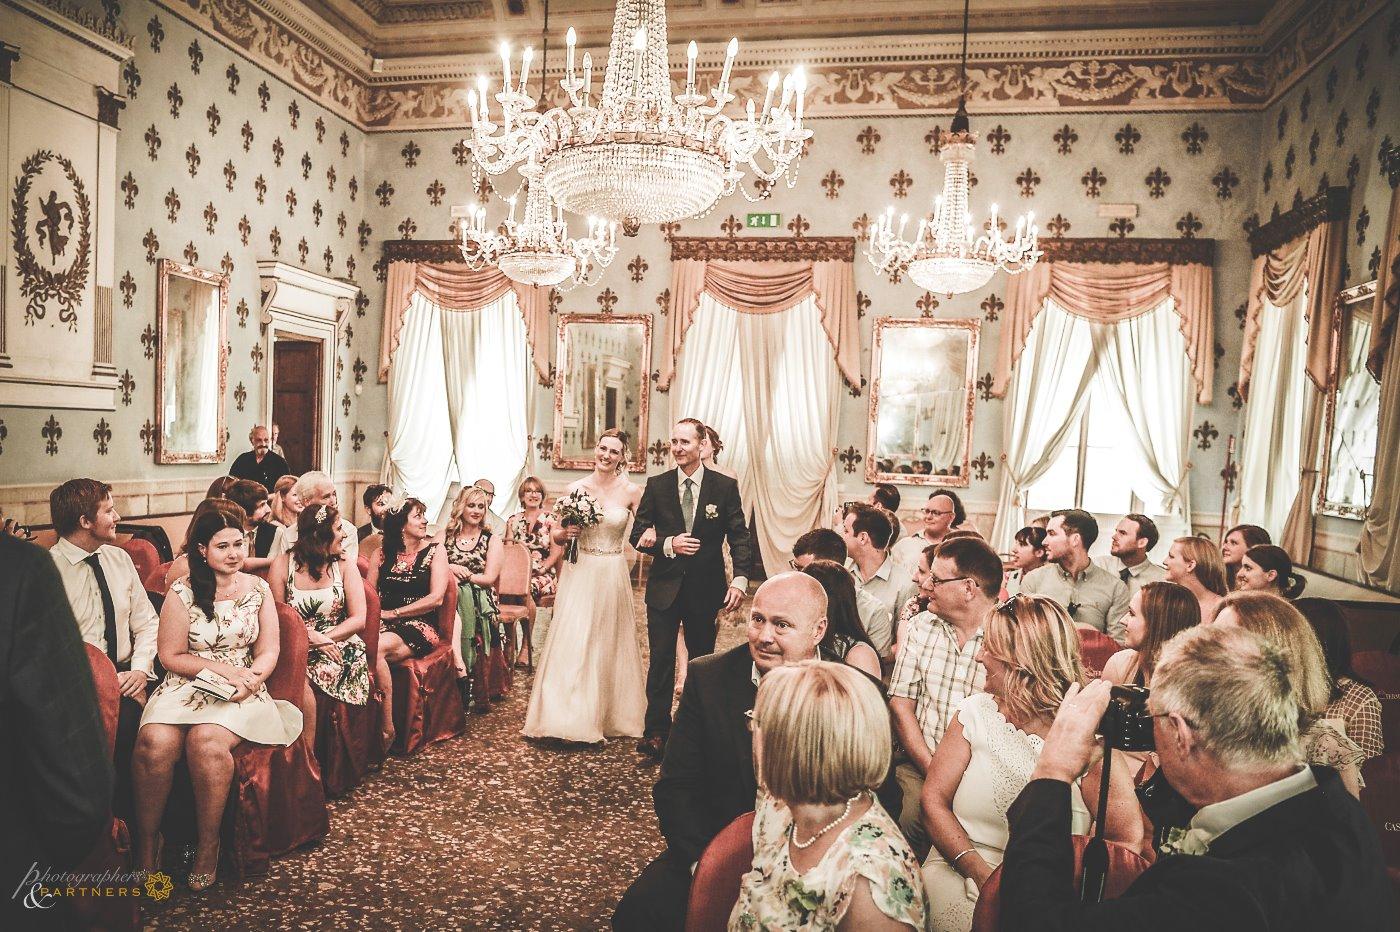 photography_weddings_bagni_lucca_04.jpg